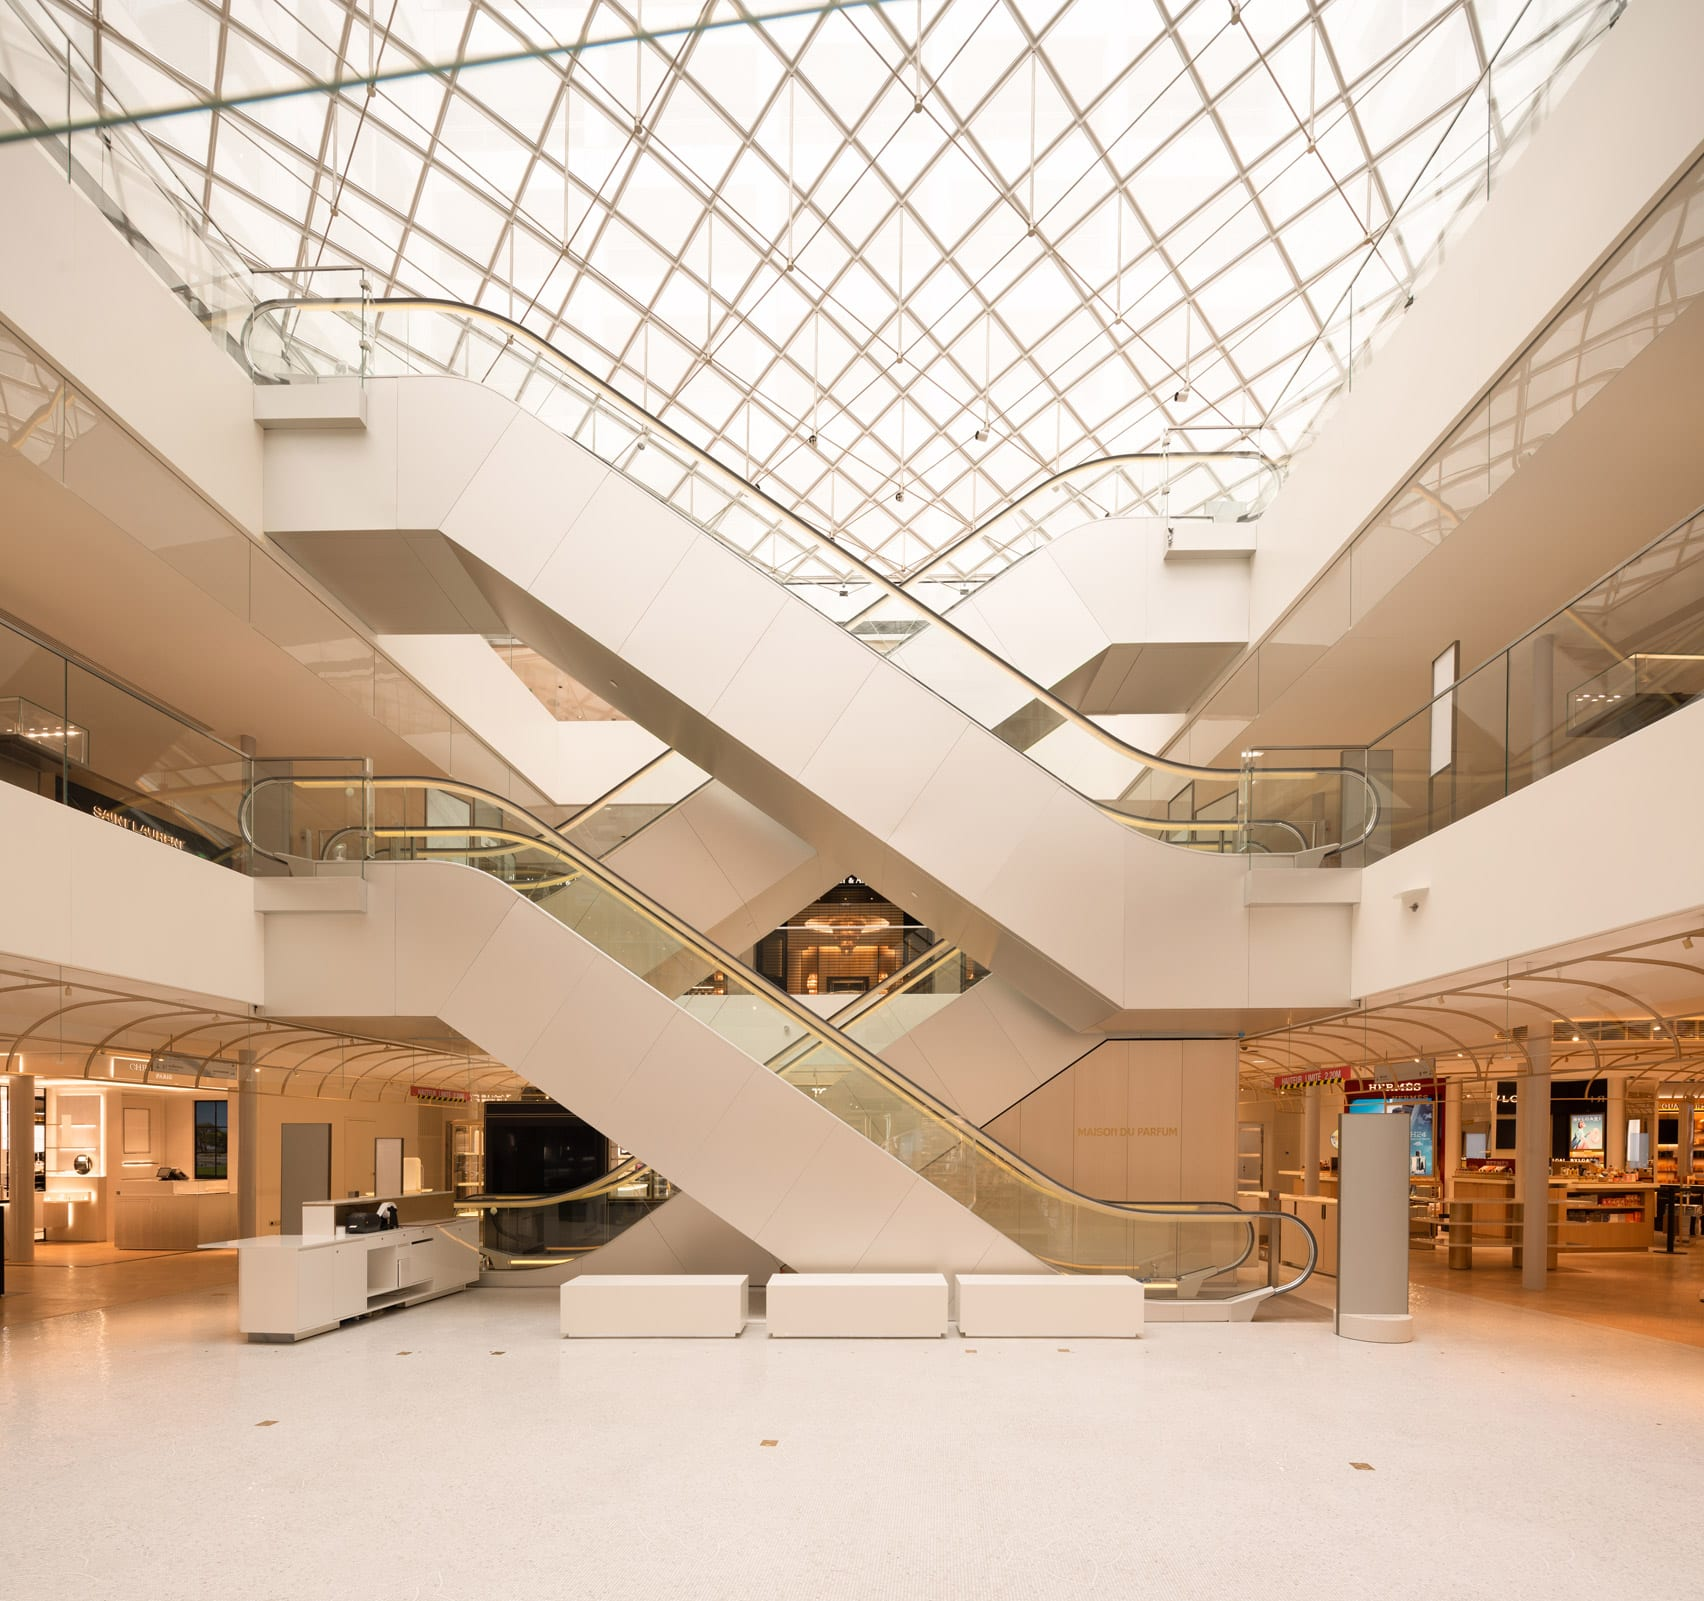 la-samaritaine-sanaa-architecture-renovations-paris-france_dezeen_1704_col_18.jpg